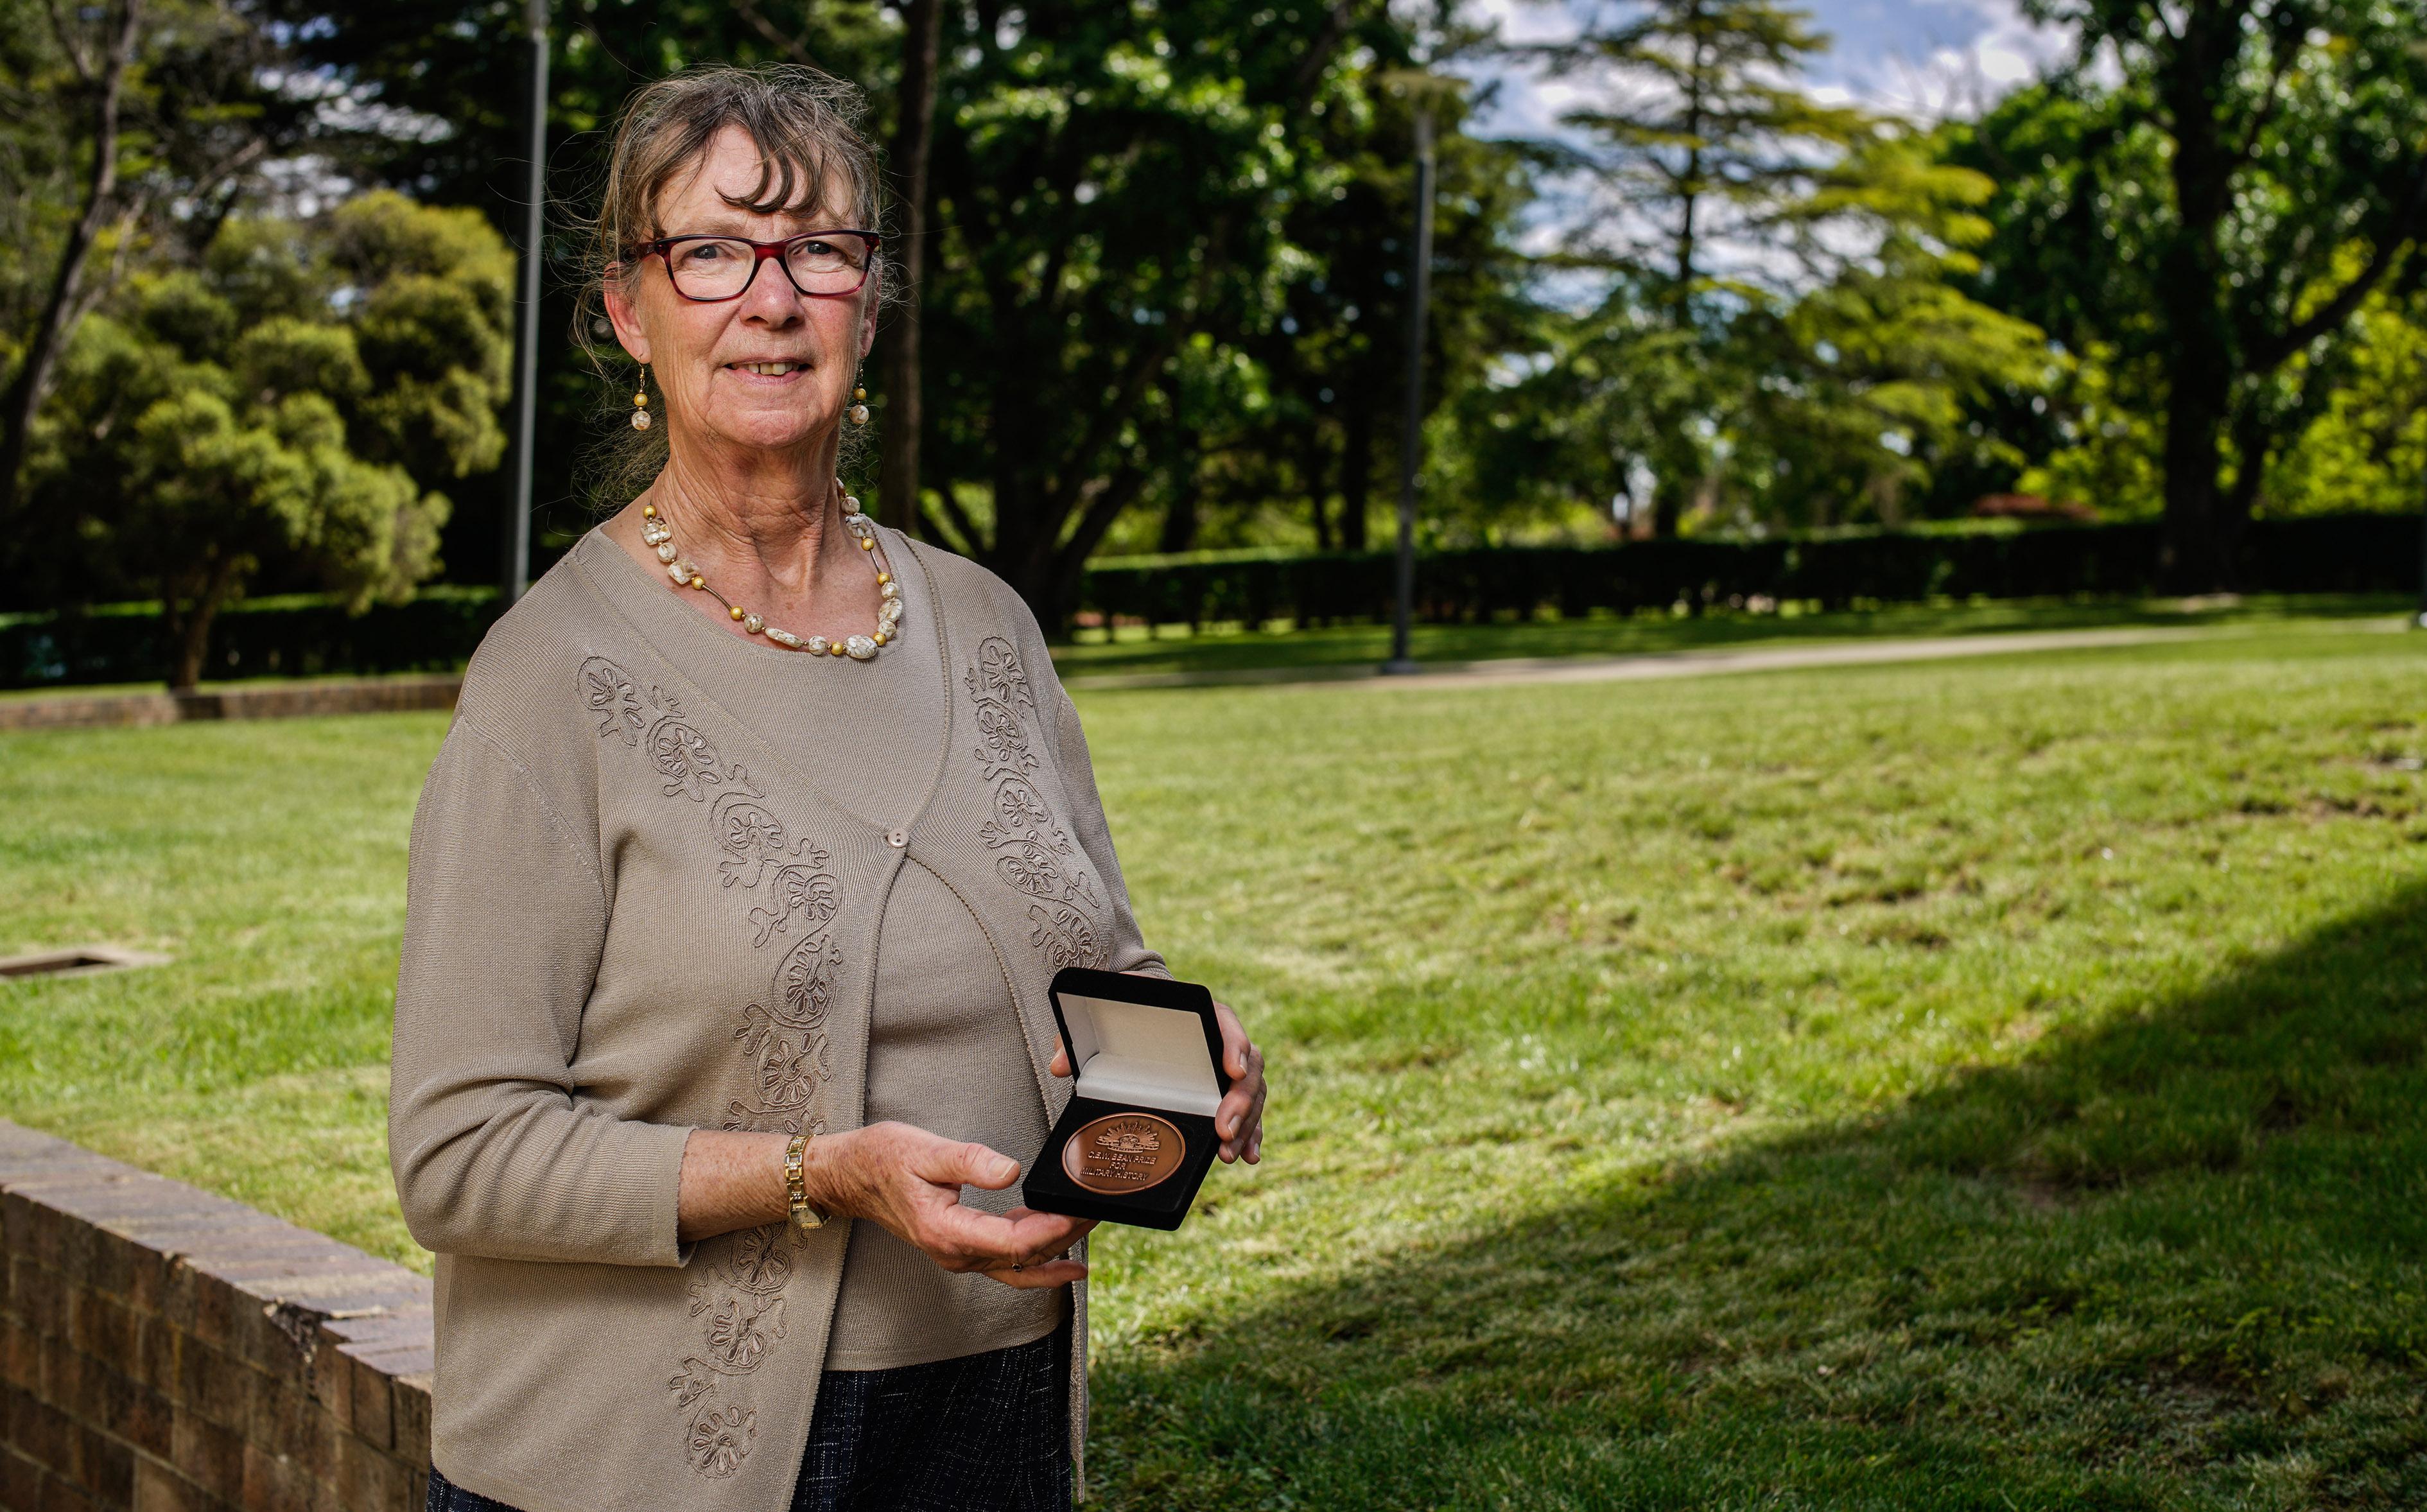 Anneke van Mosseveld holding a medal